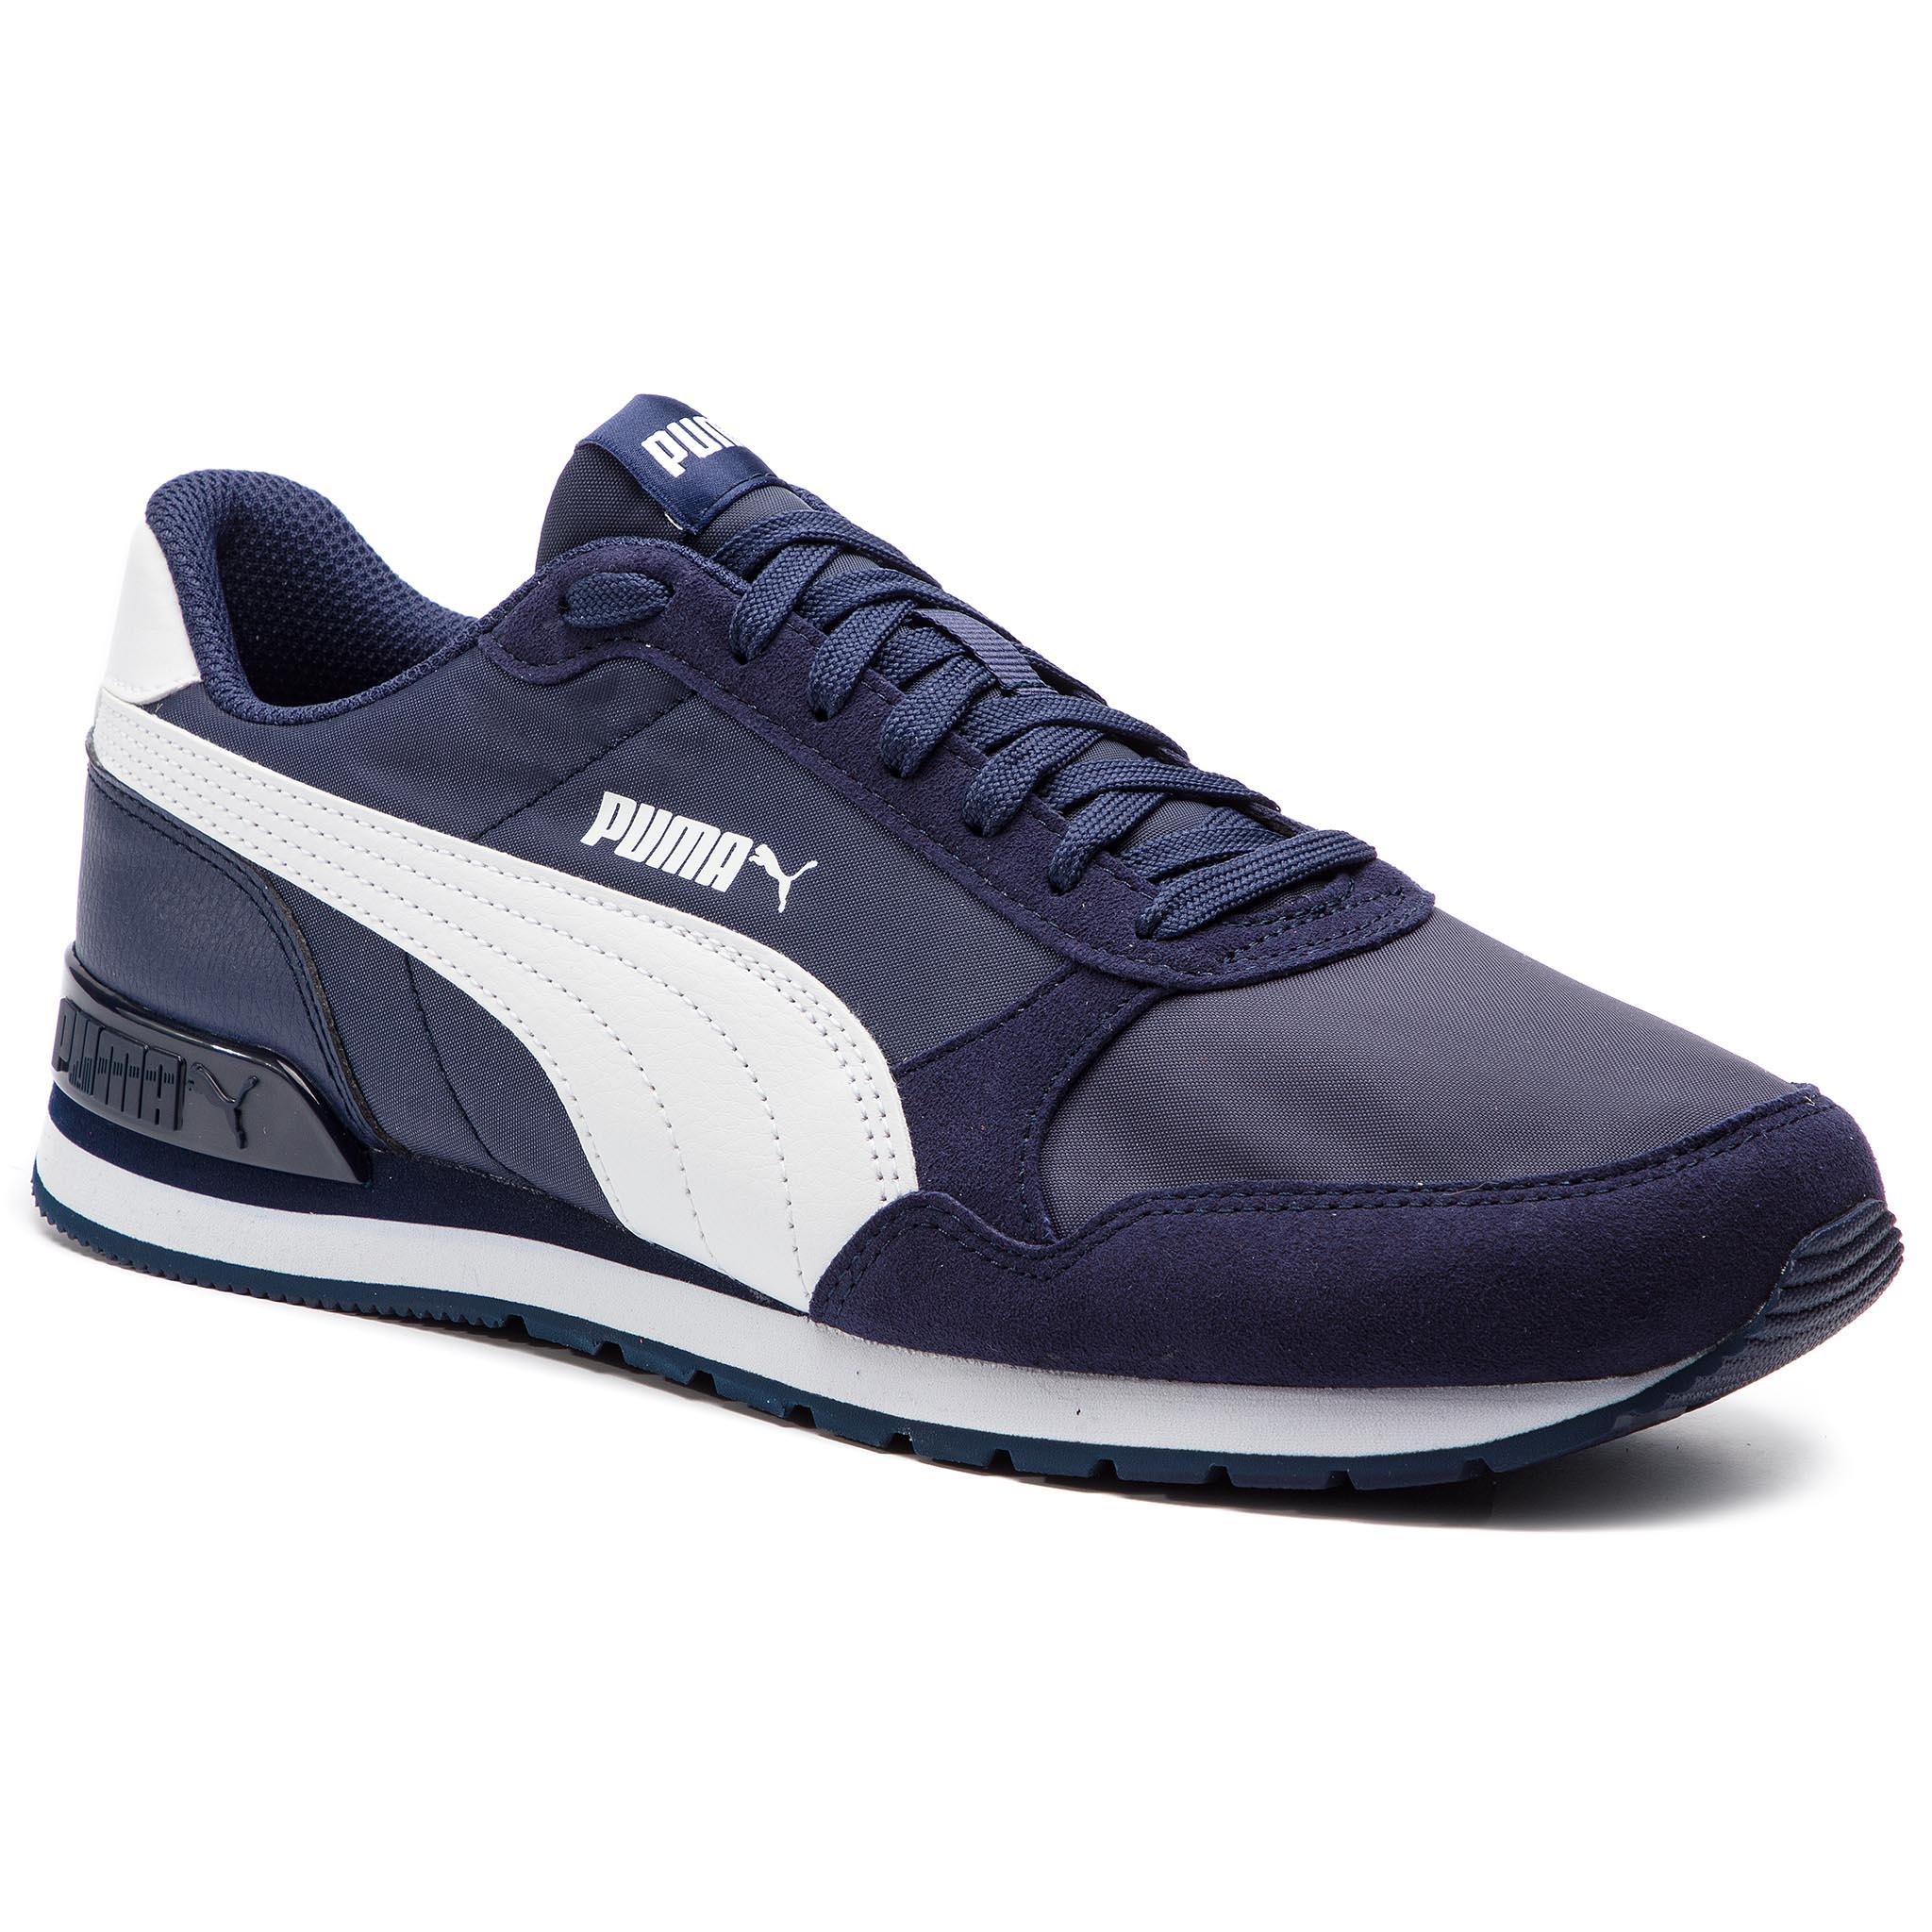 2a2b081c Sneakers PUMA - St Runner V2 NL 365278 16 Elderberry/Puma White ...